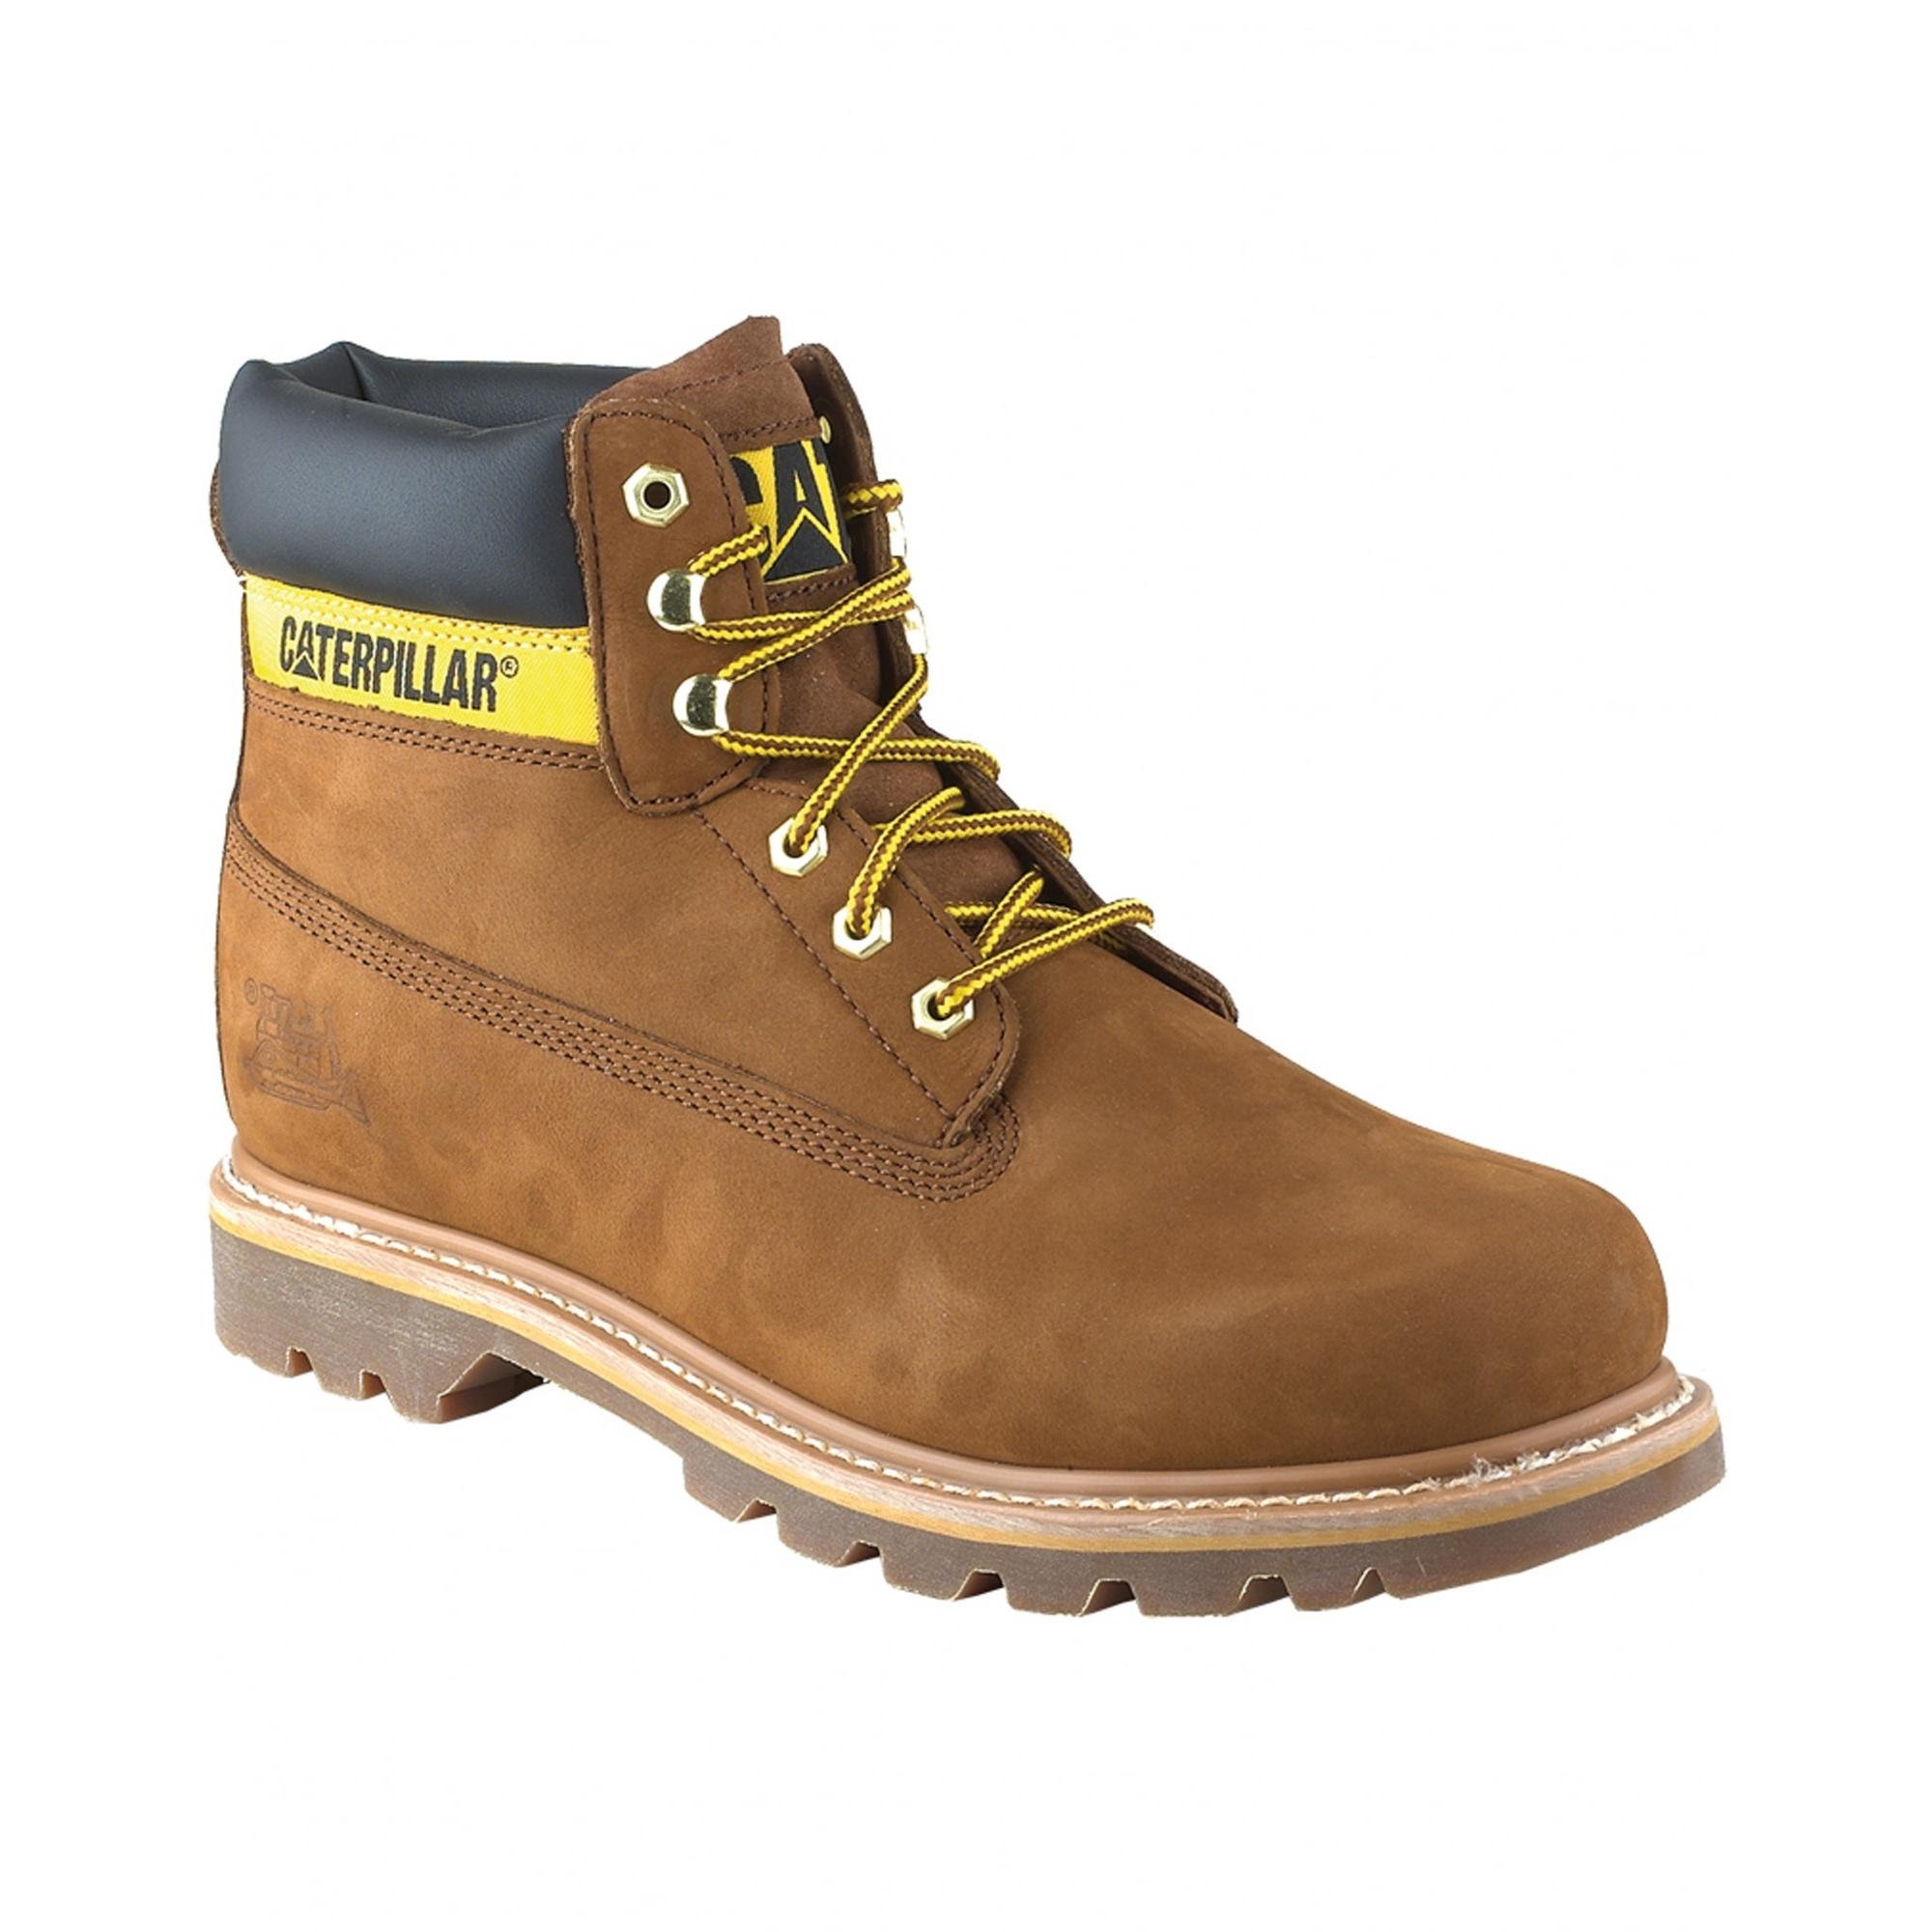 Billig Stiefel gute Qualität Caterpillar Farbeado Stiefel Billig (FS902) eeb12f